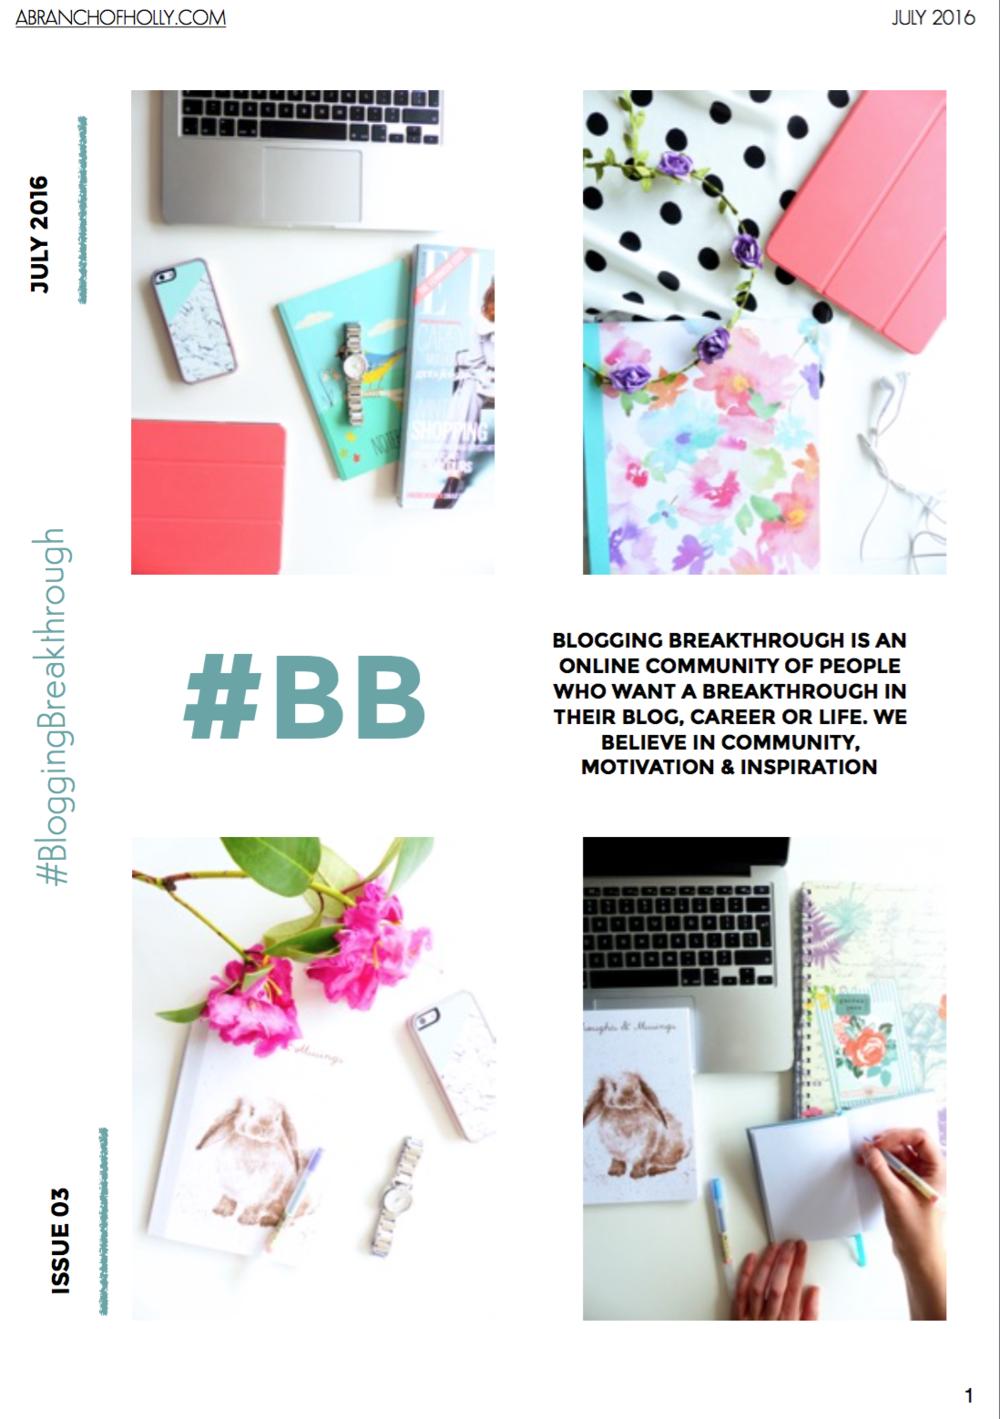 blogging breakthrough july 2016 issue 03